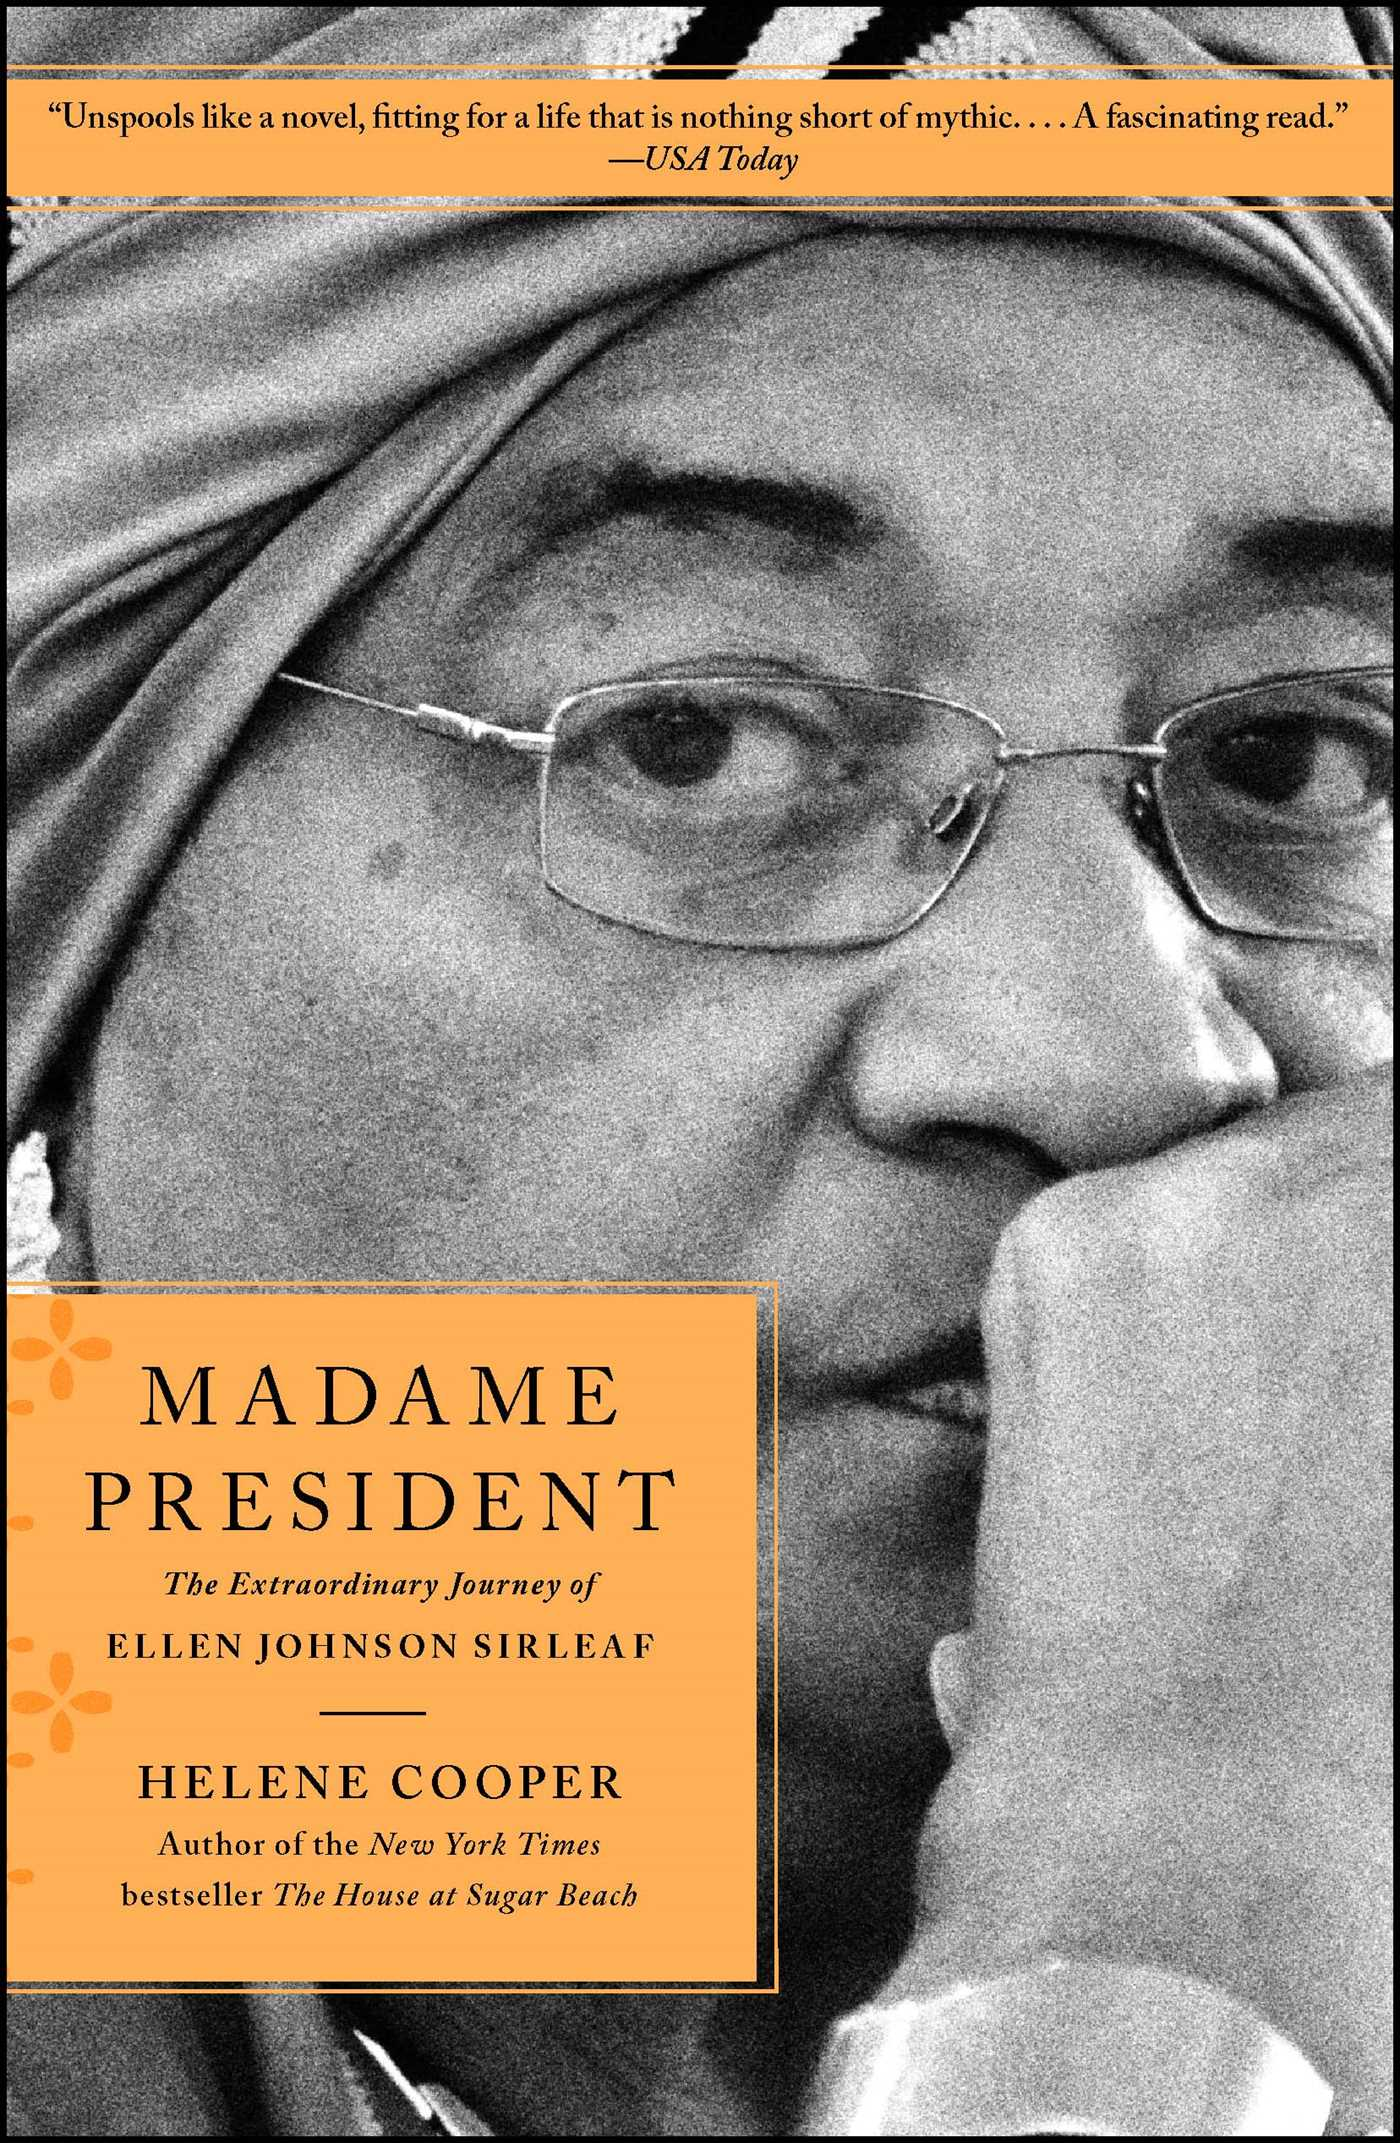 Madame president 9781451697377 hr